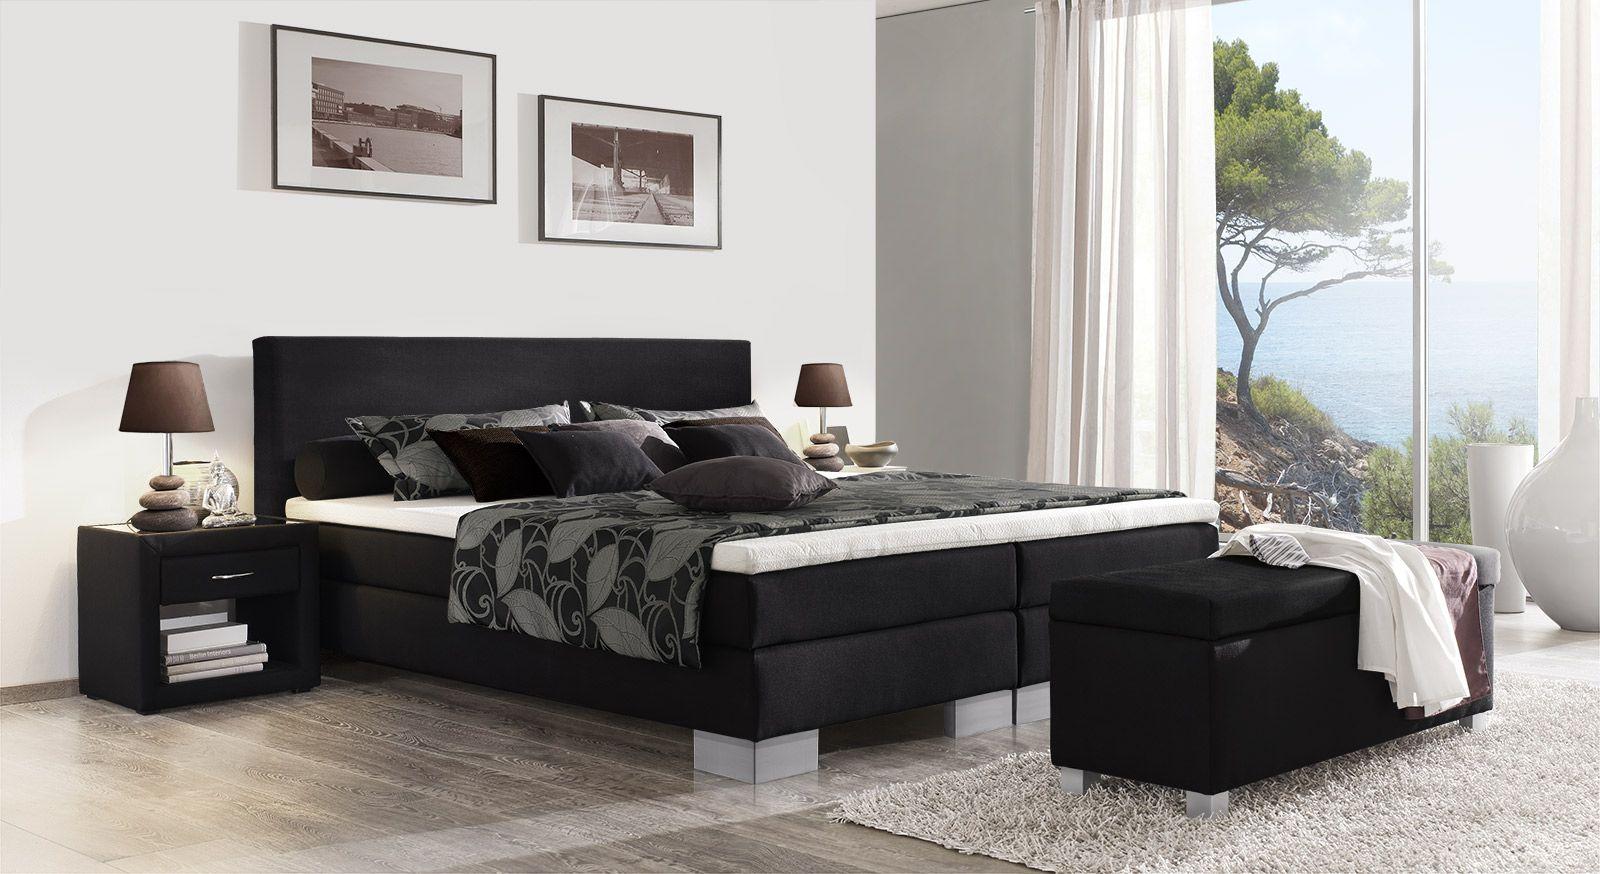 "boxspringbett schwarz 180x200, boxspringbett ""puebla"" | pinterest | master bedroom and bedrooms, Design ideen"